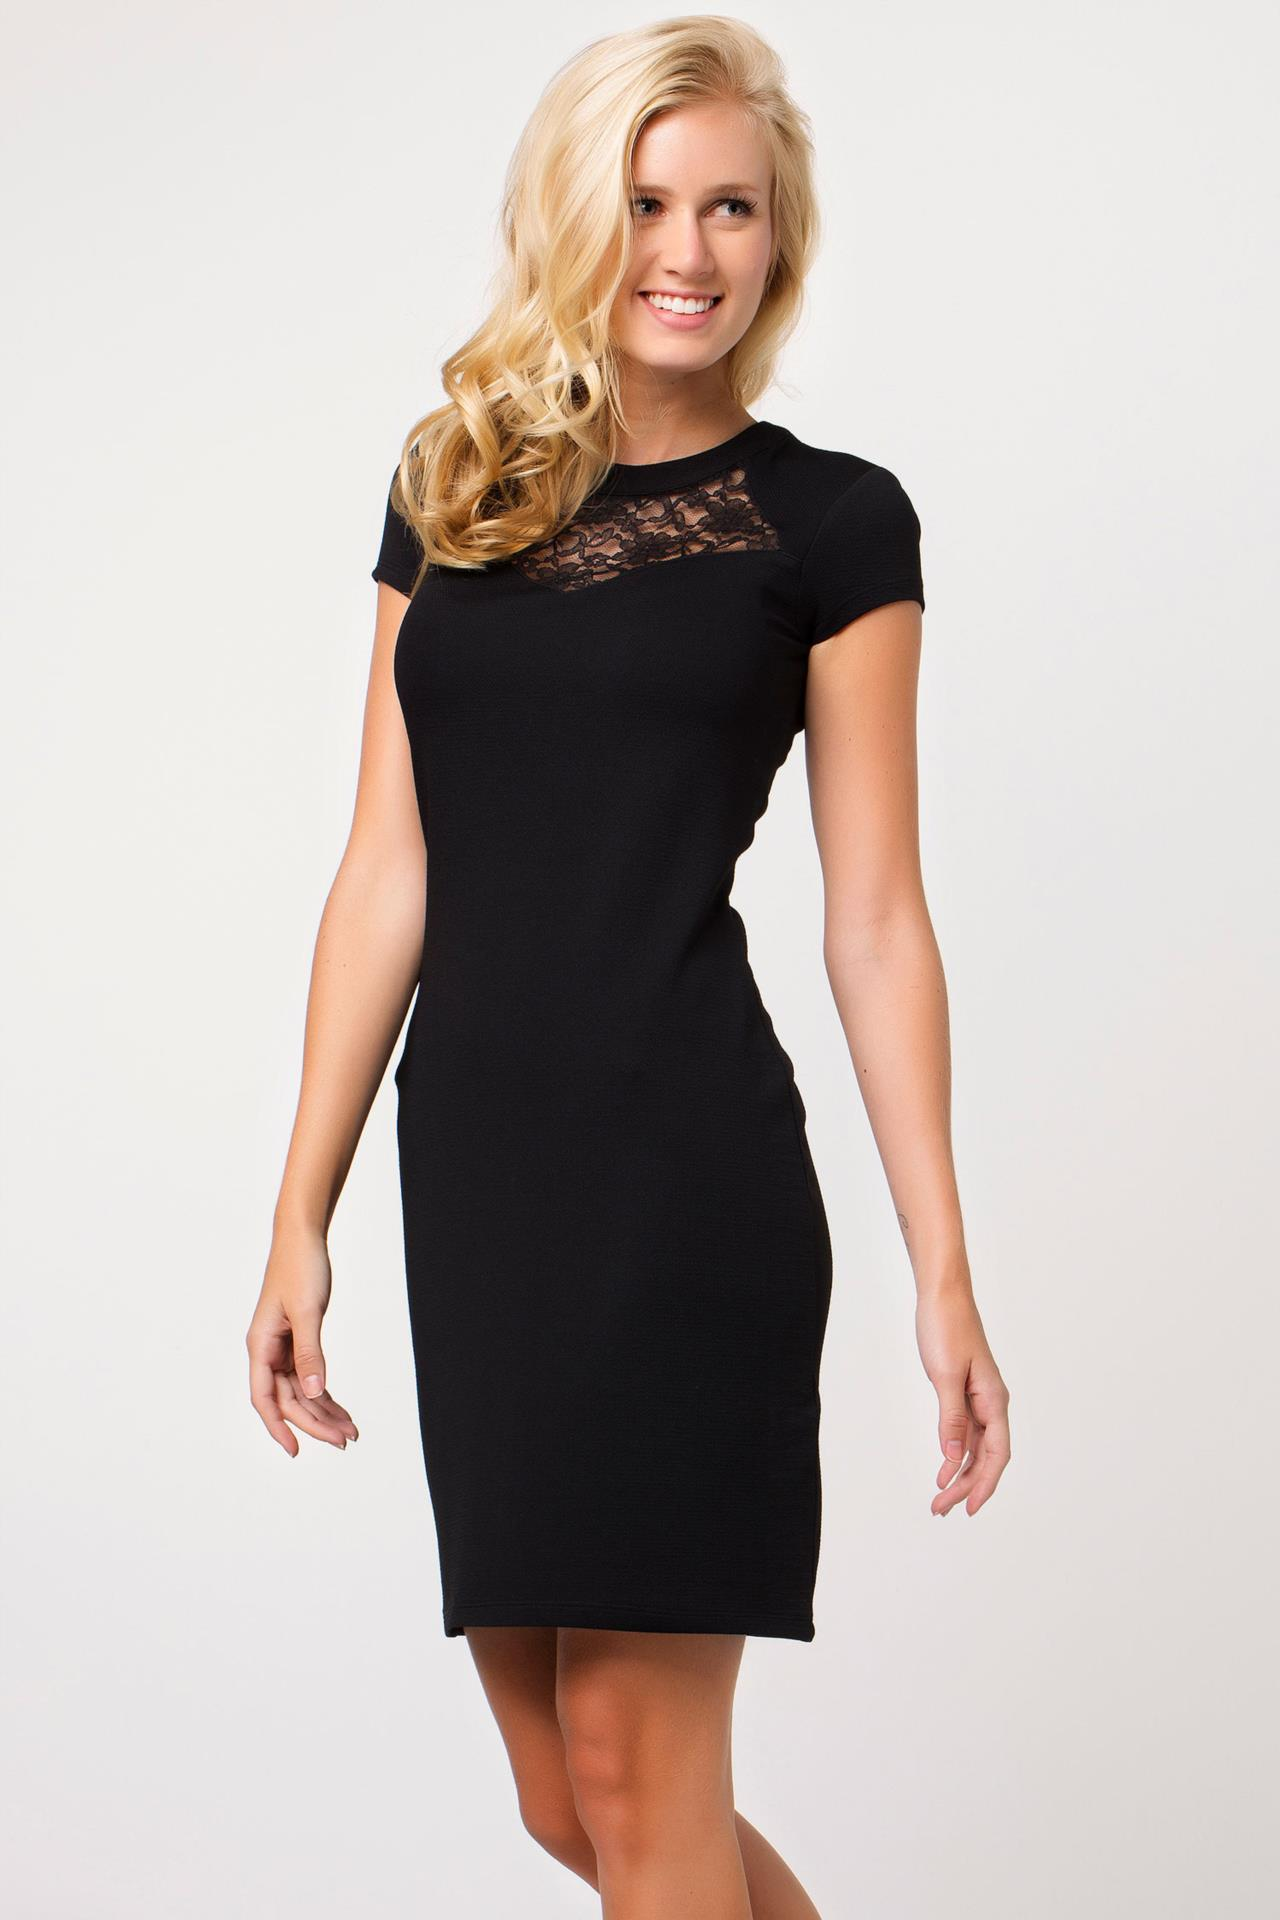 En Şık DeFacto Elbise Modeli